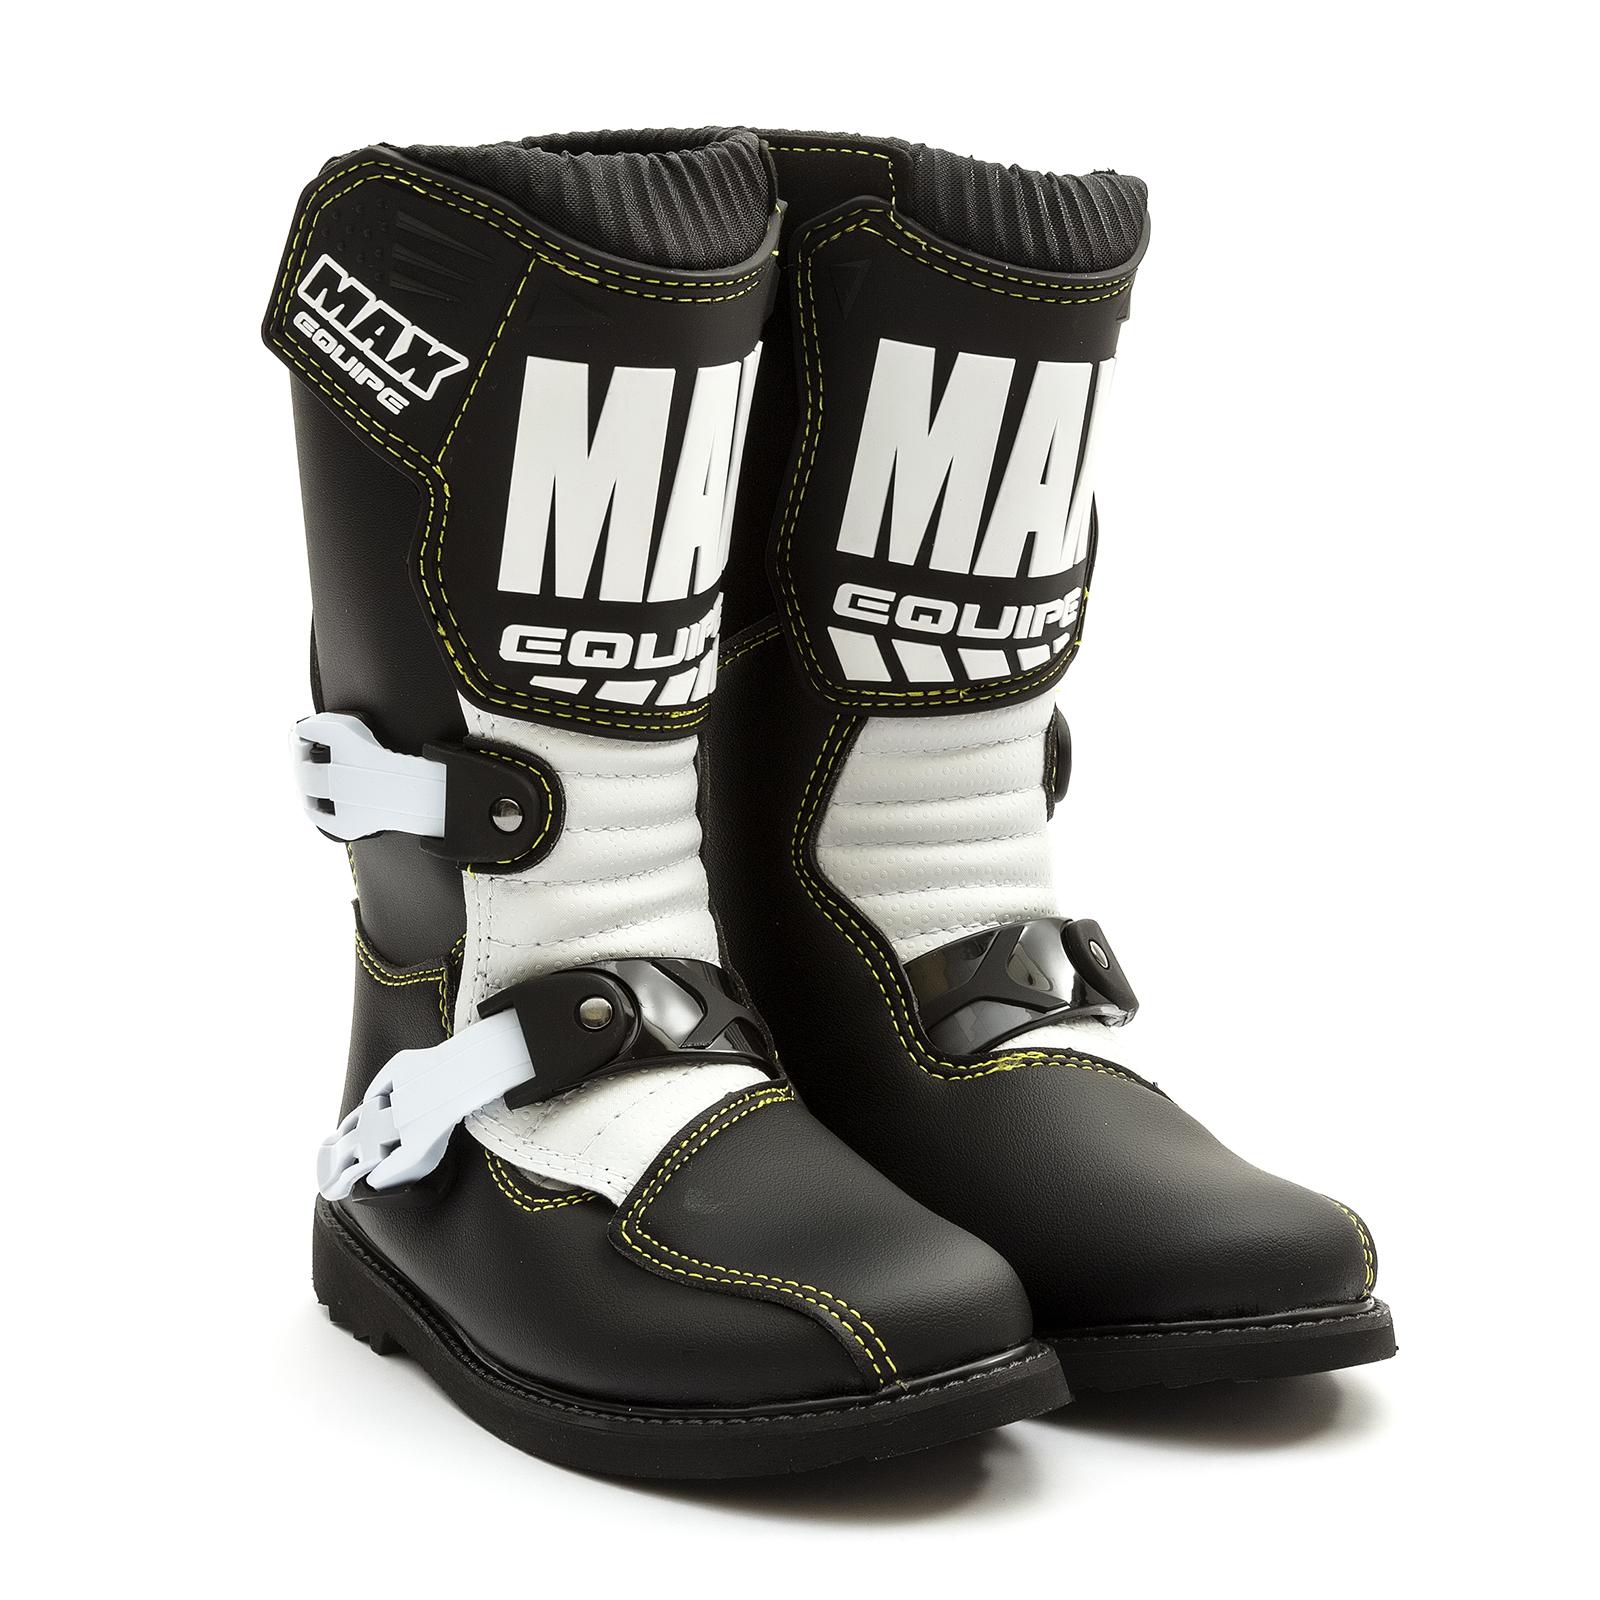 Wulfsport Cub LA Junior Kids Leather Motocross Boots EU 29 // UK Kids 11, Black